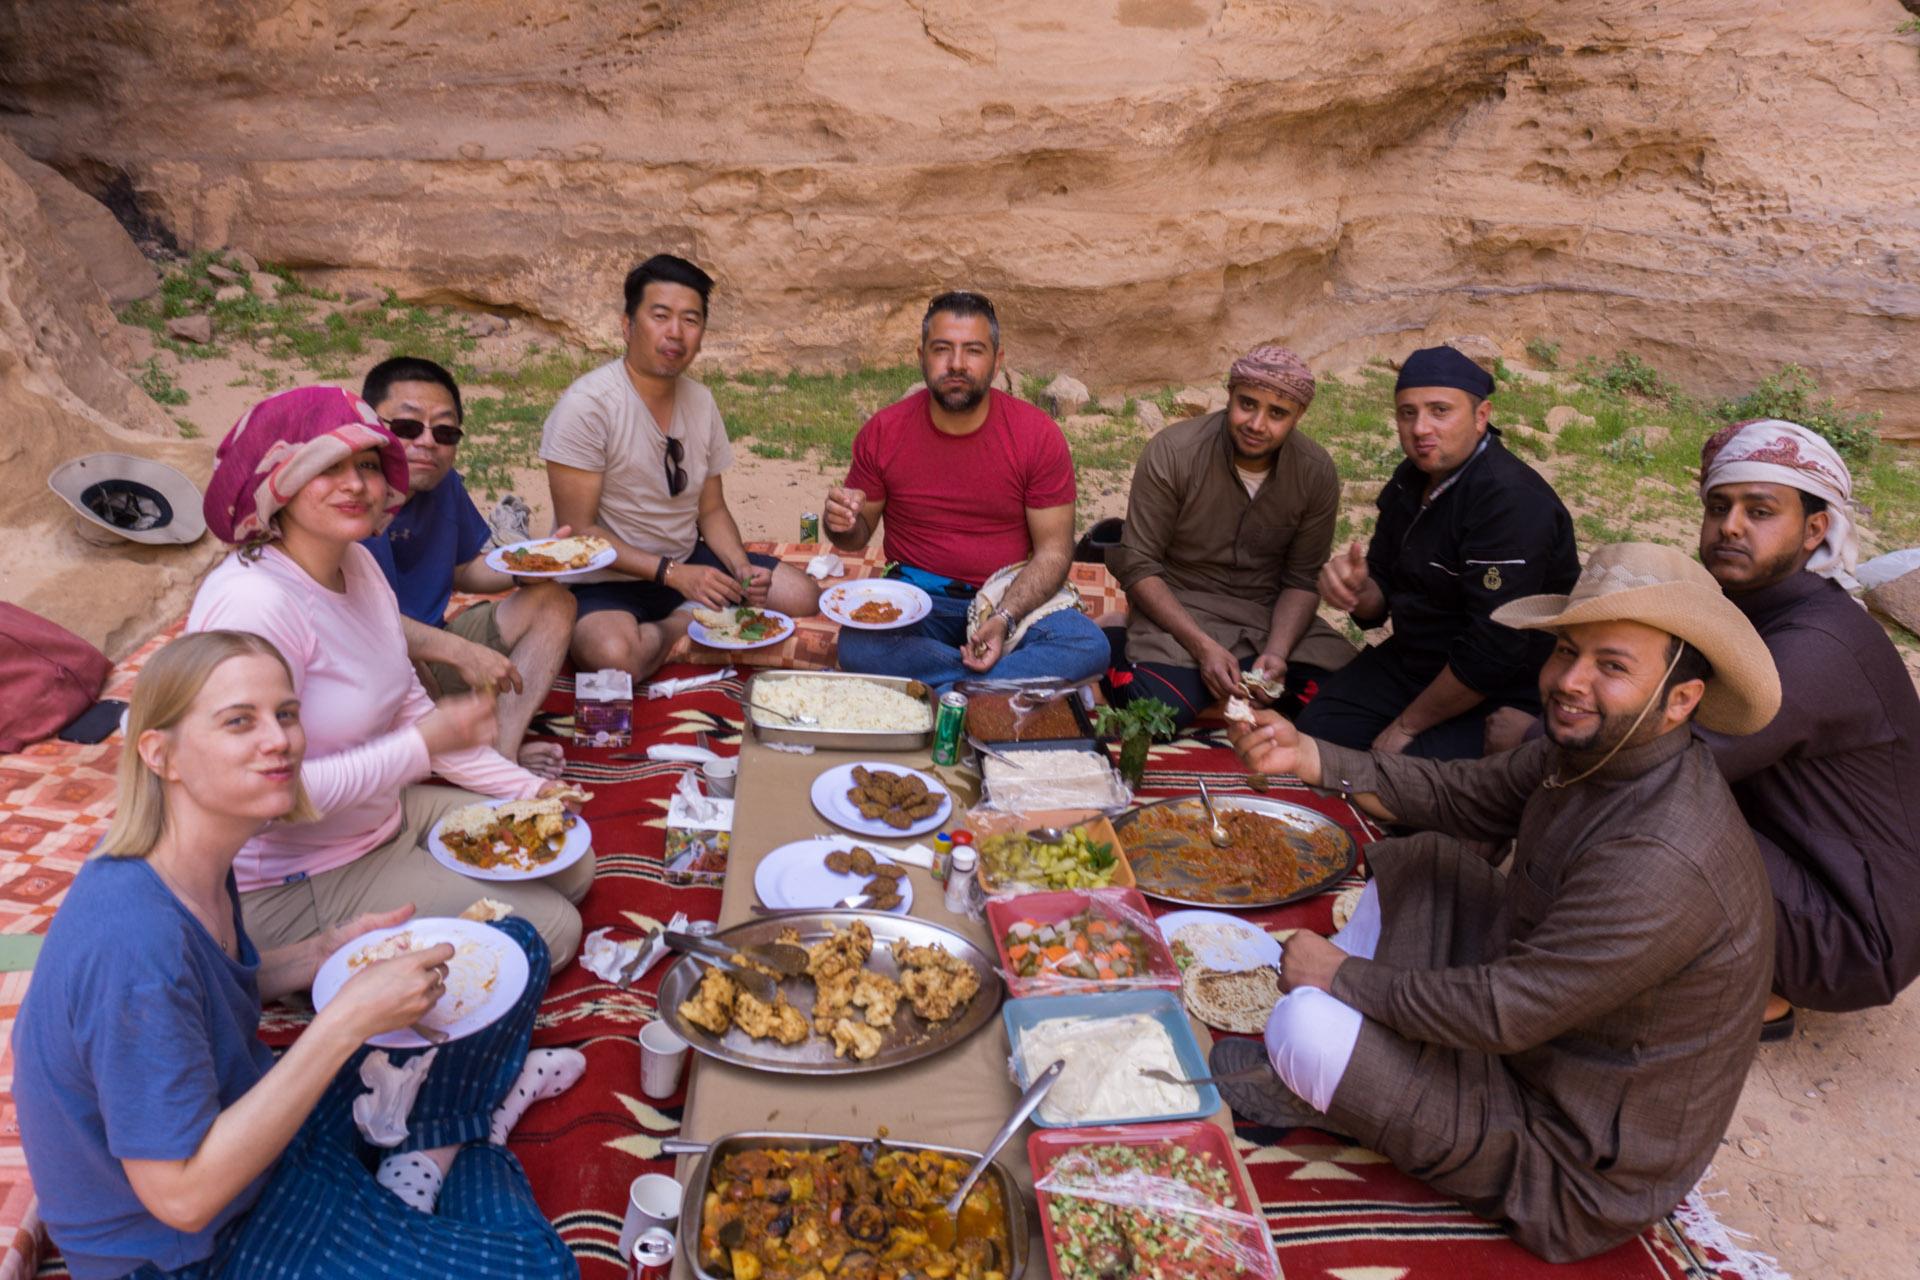 Picnic in the Wadi Rum desert